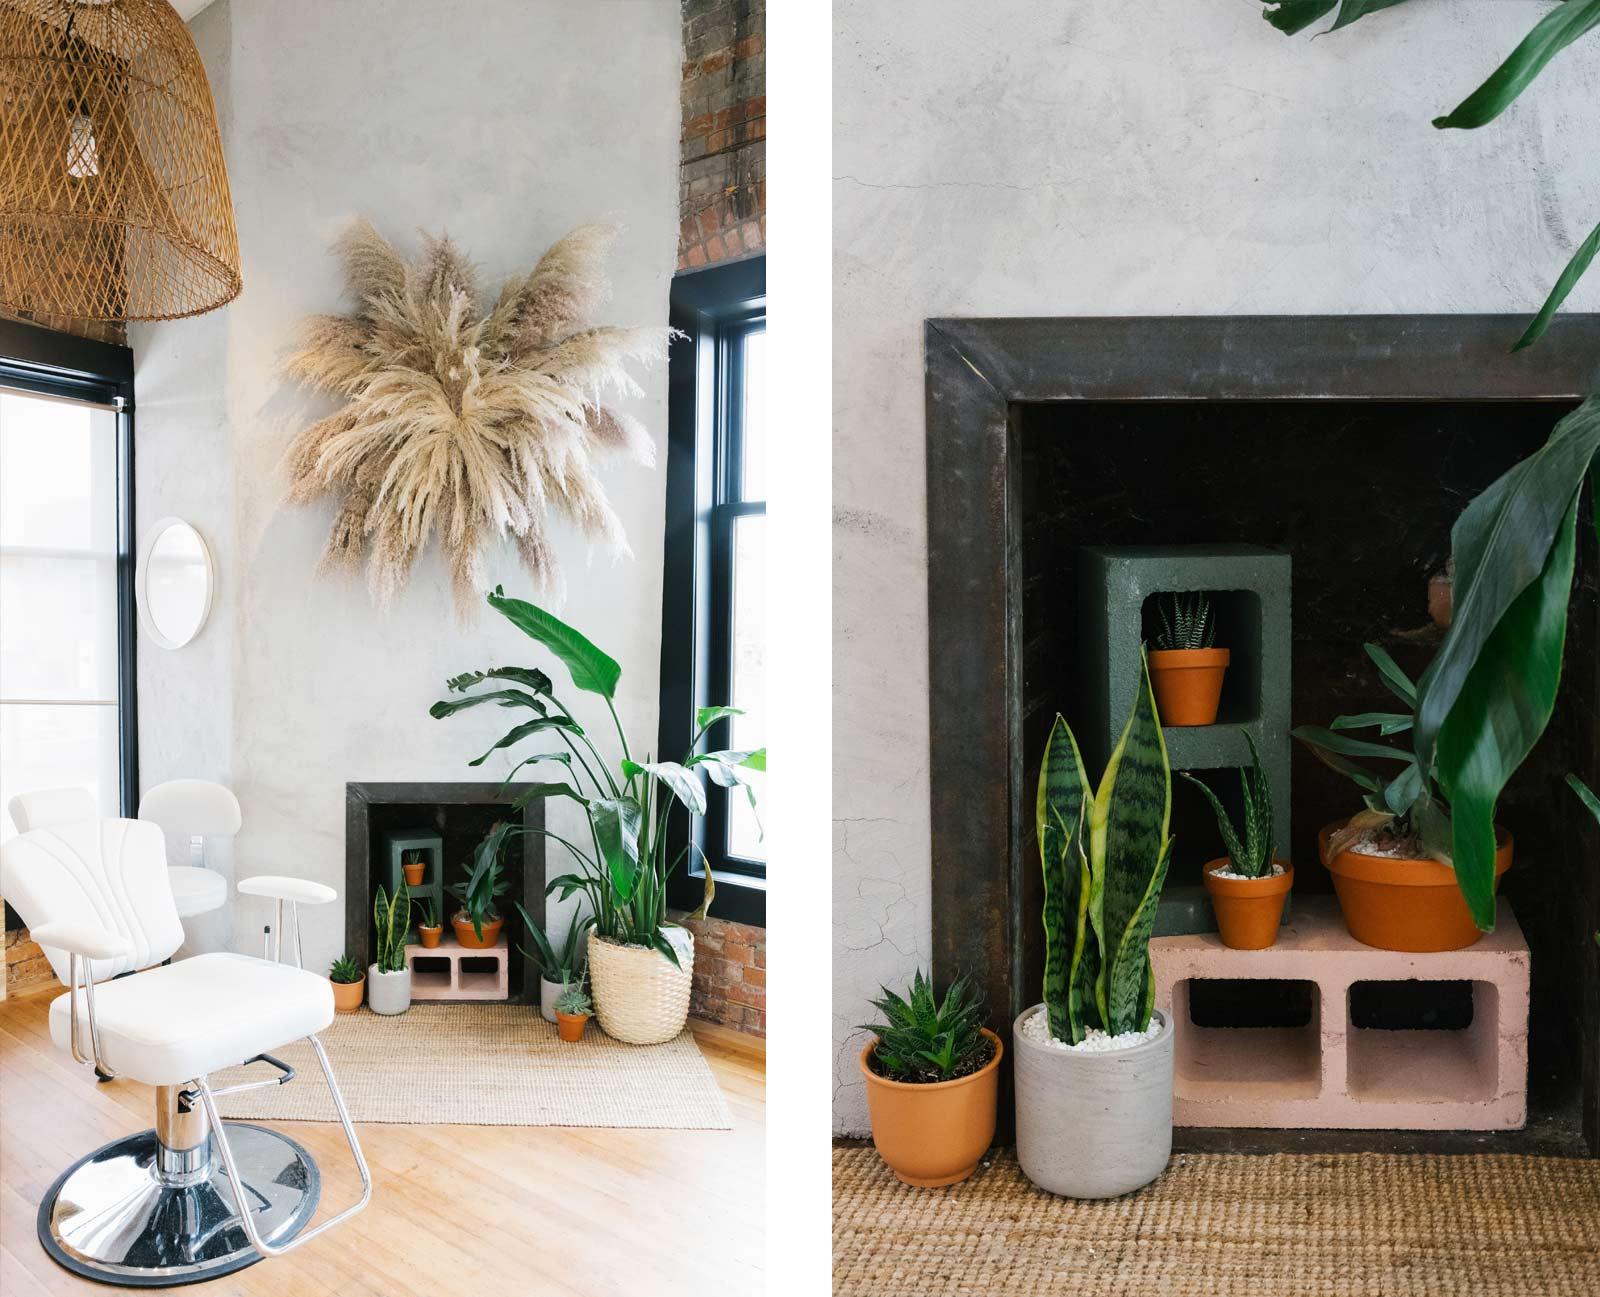 Laura Brows | Commercial Interior Design | Health & Wellness Interior Design Calgary